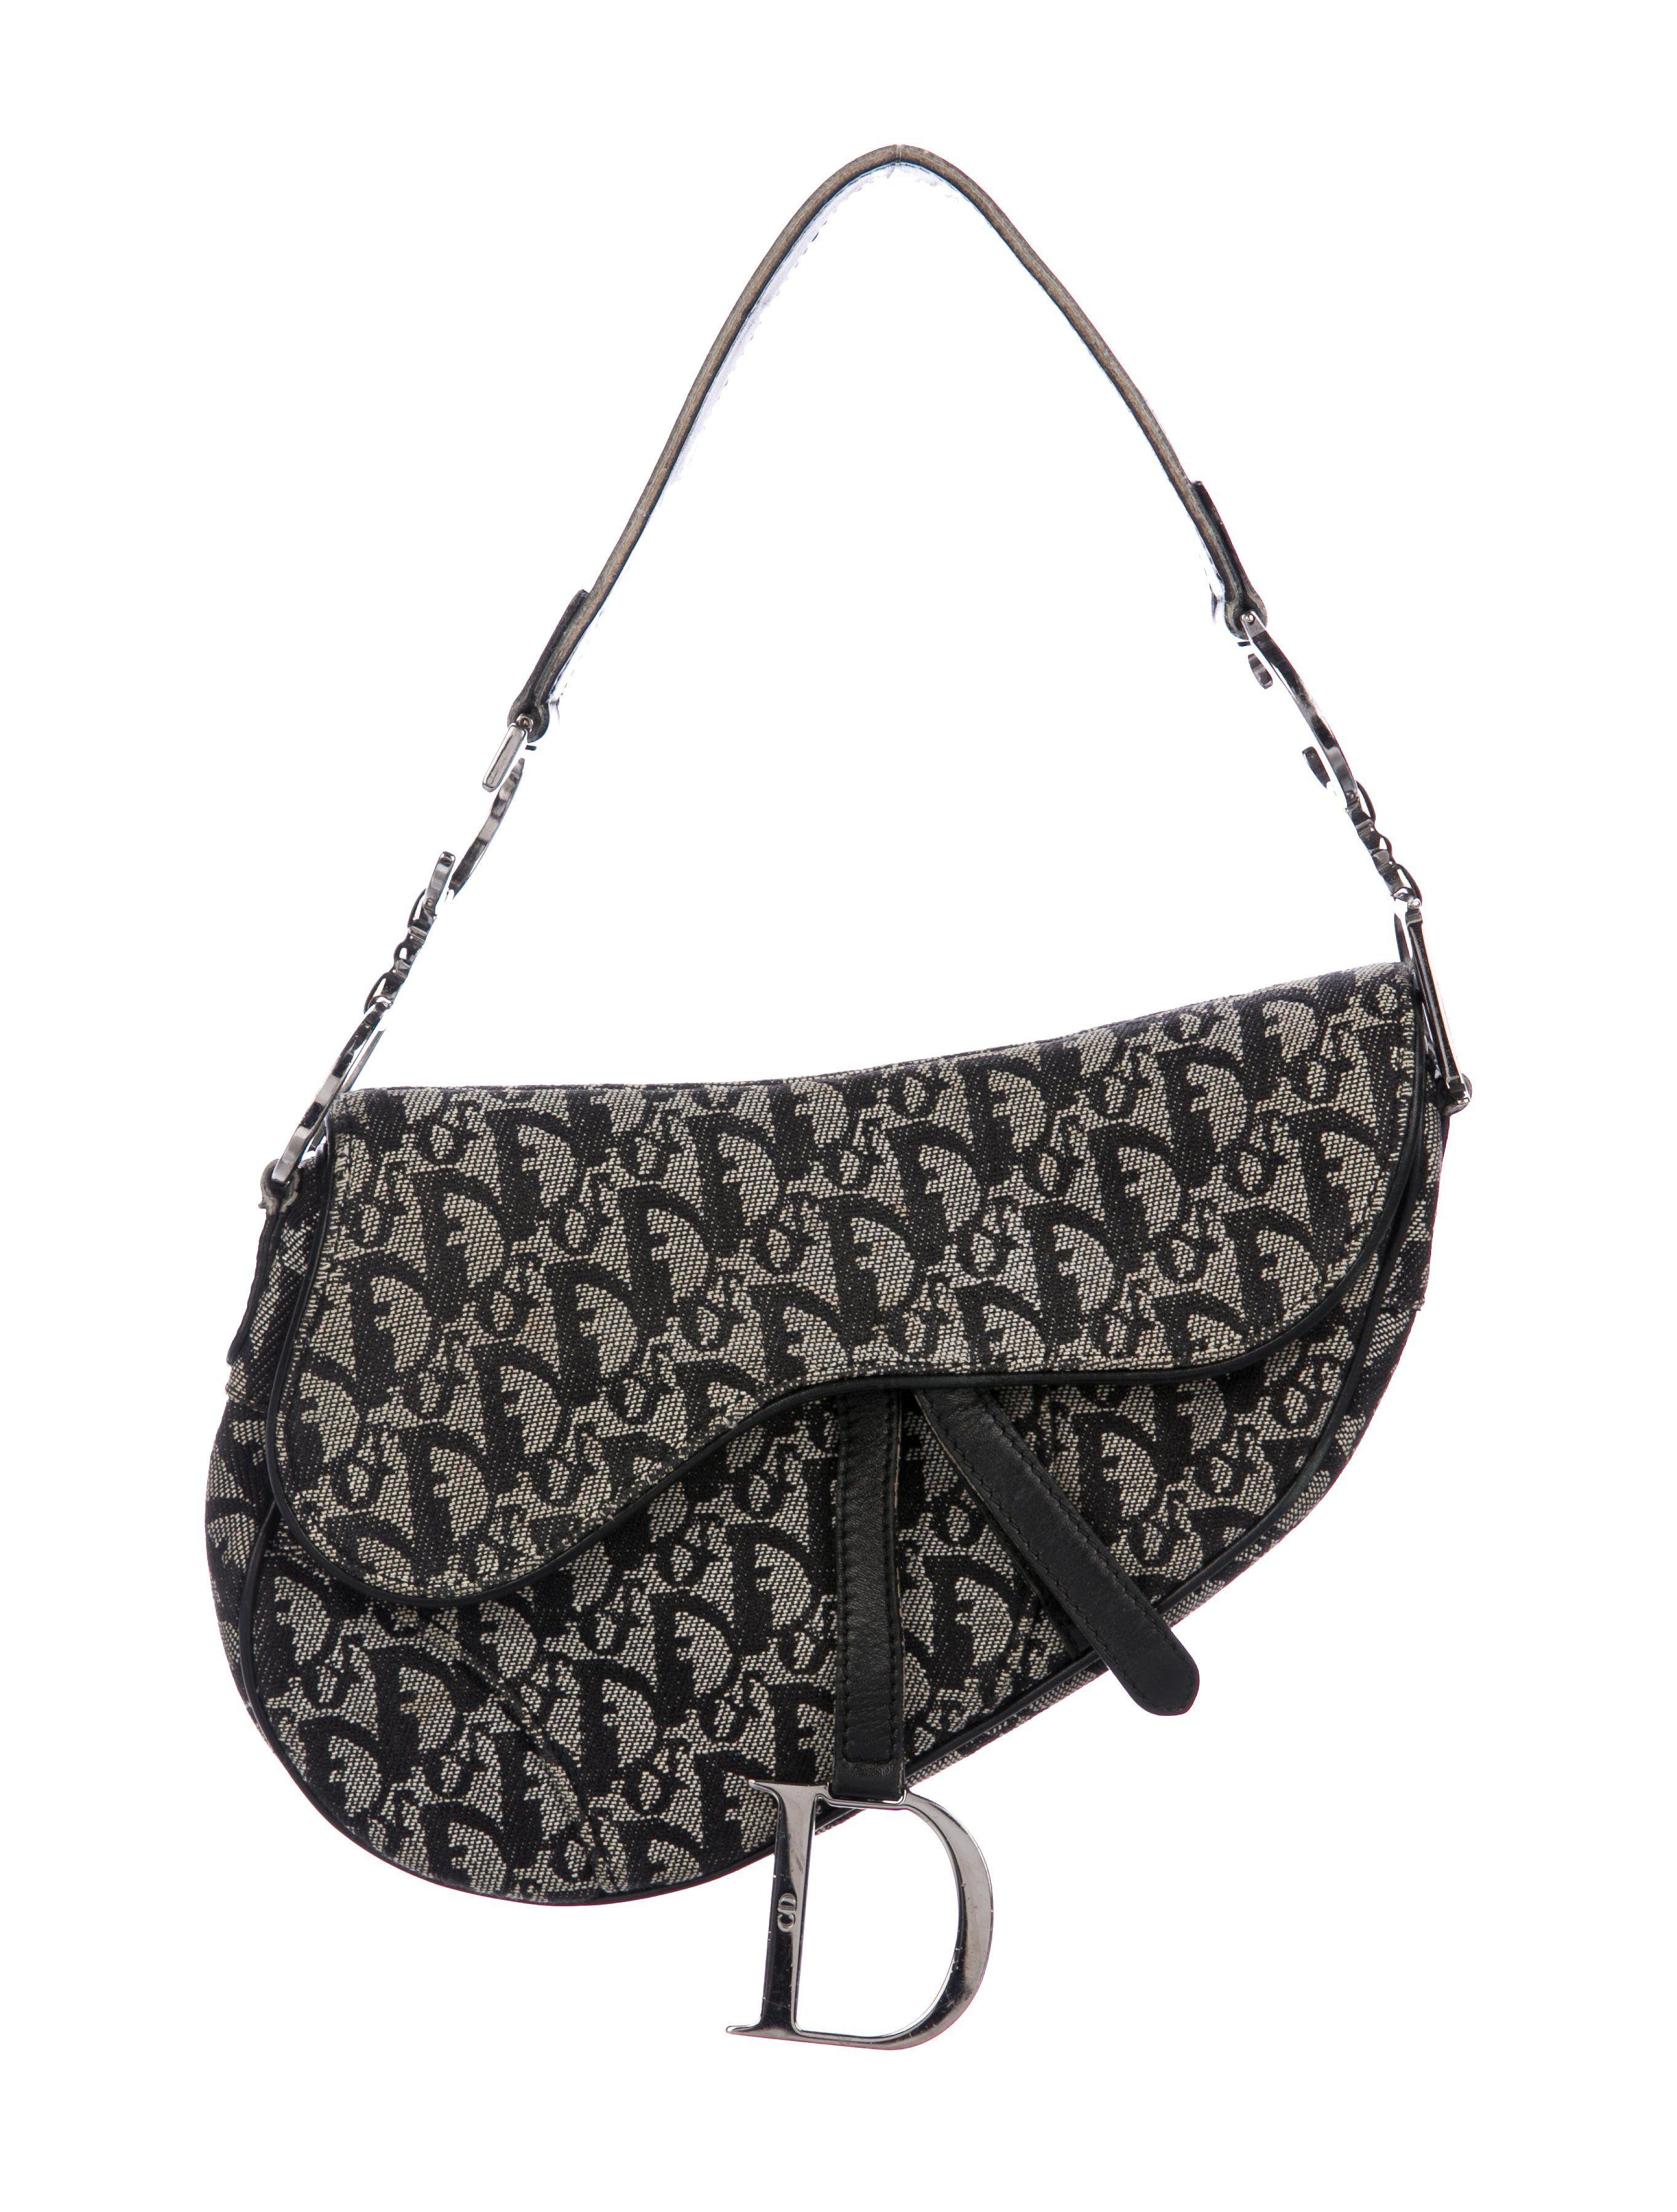 64d8c1c0502e Black and creme Diorissimo canvas Christian Dior Saddle Bag with  silver-tone hardware